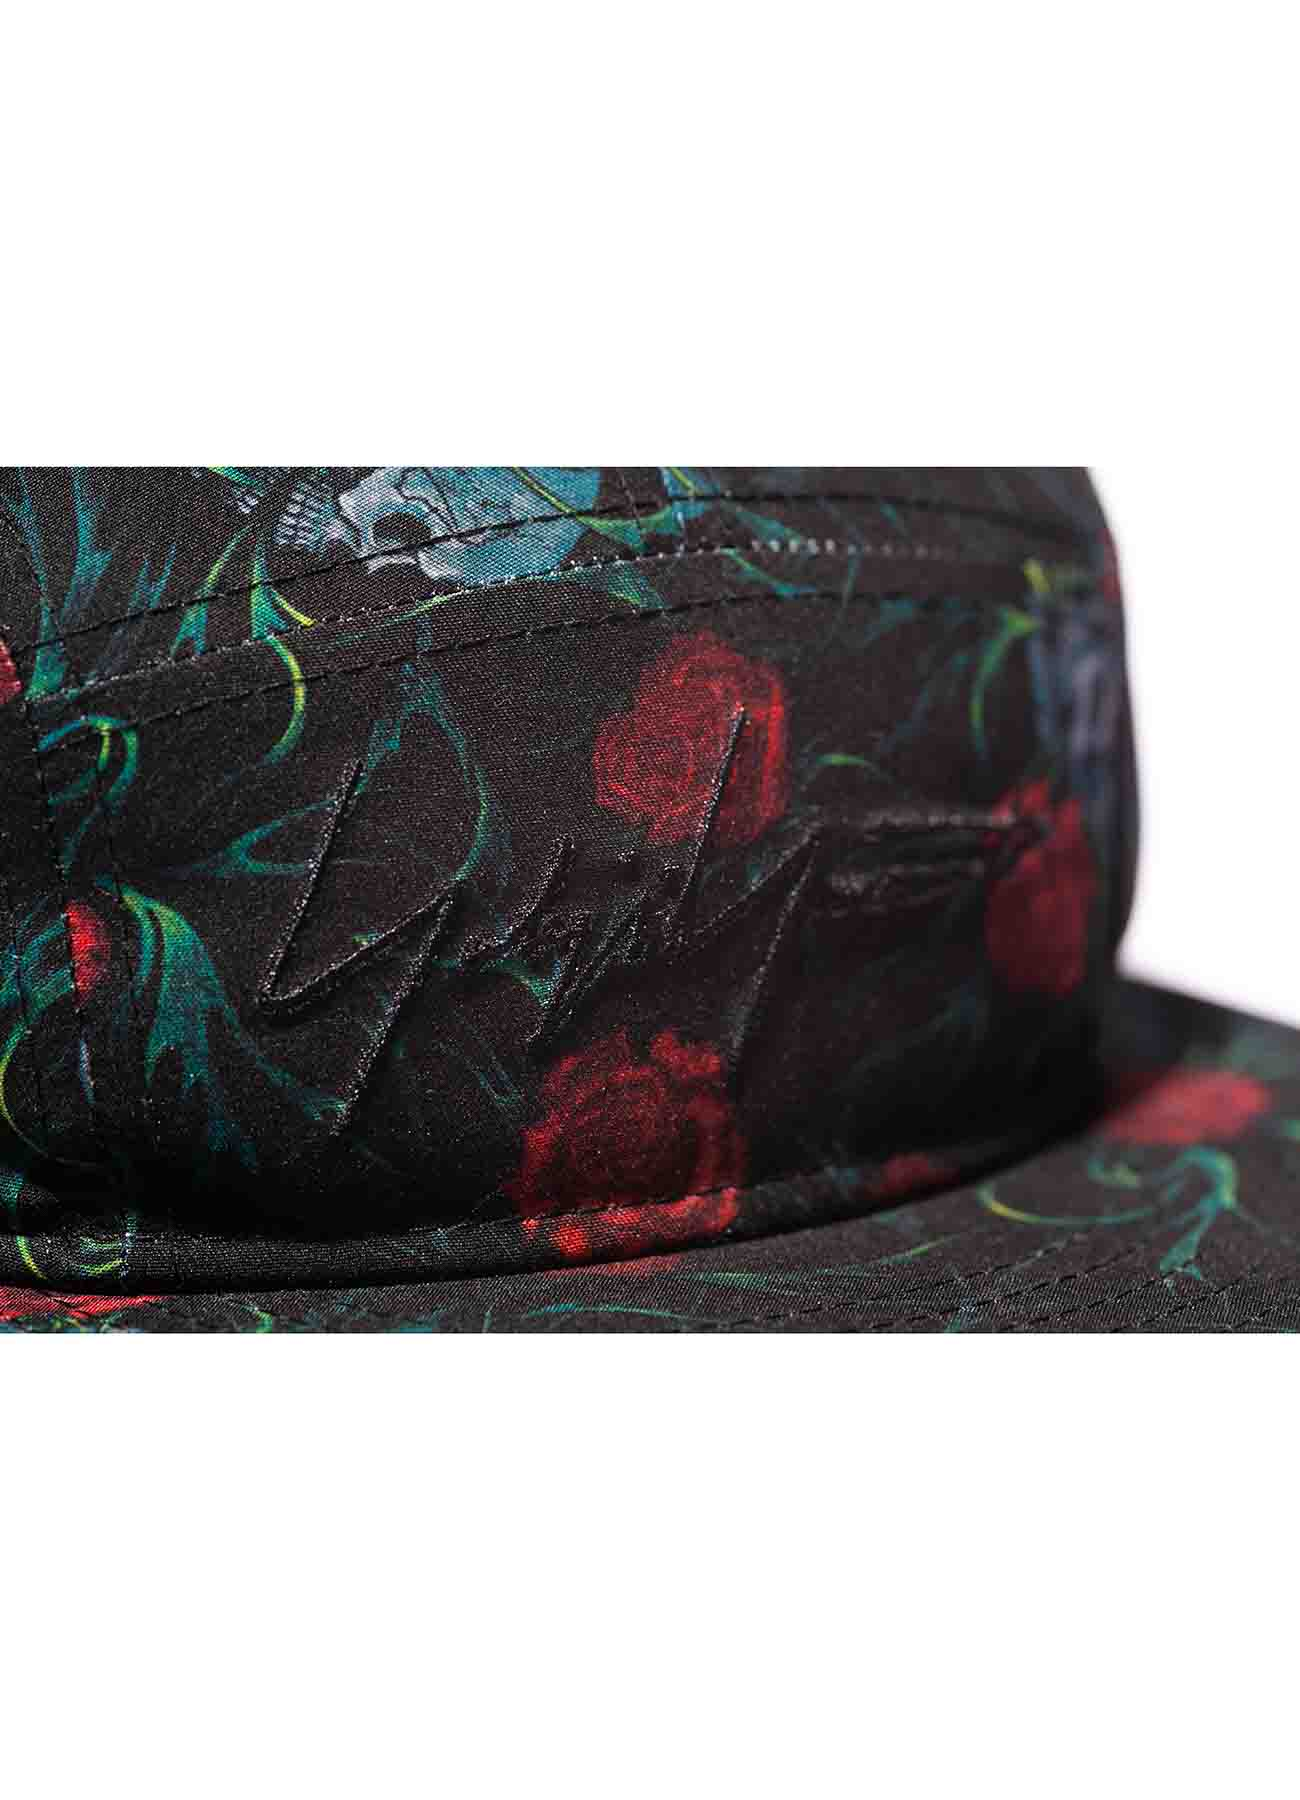 Yohji Yamamoto × New Era POLYESTER TRANSCRIPTION PRINT SKULL ROSE JET CAP BLACK RED